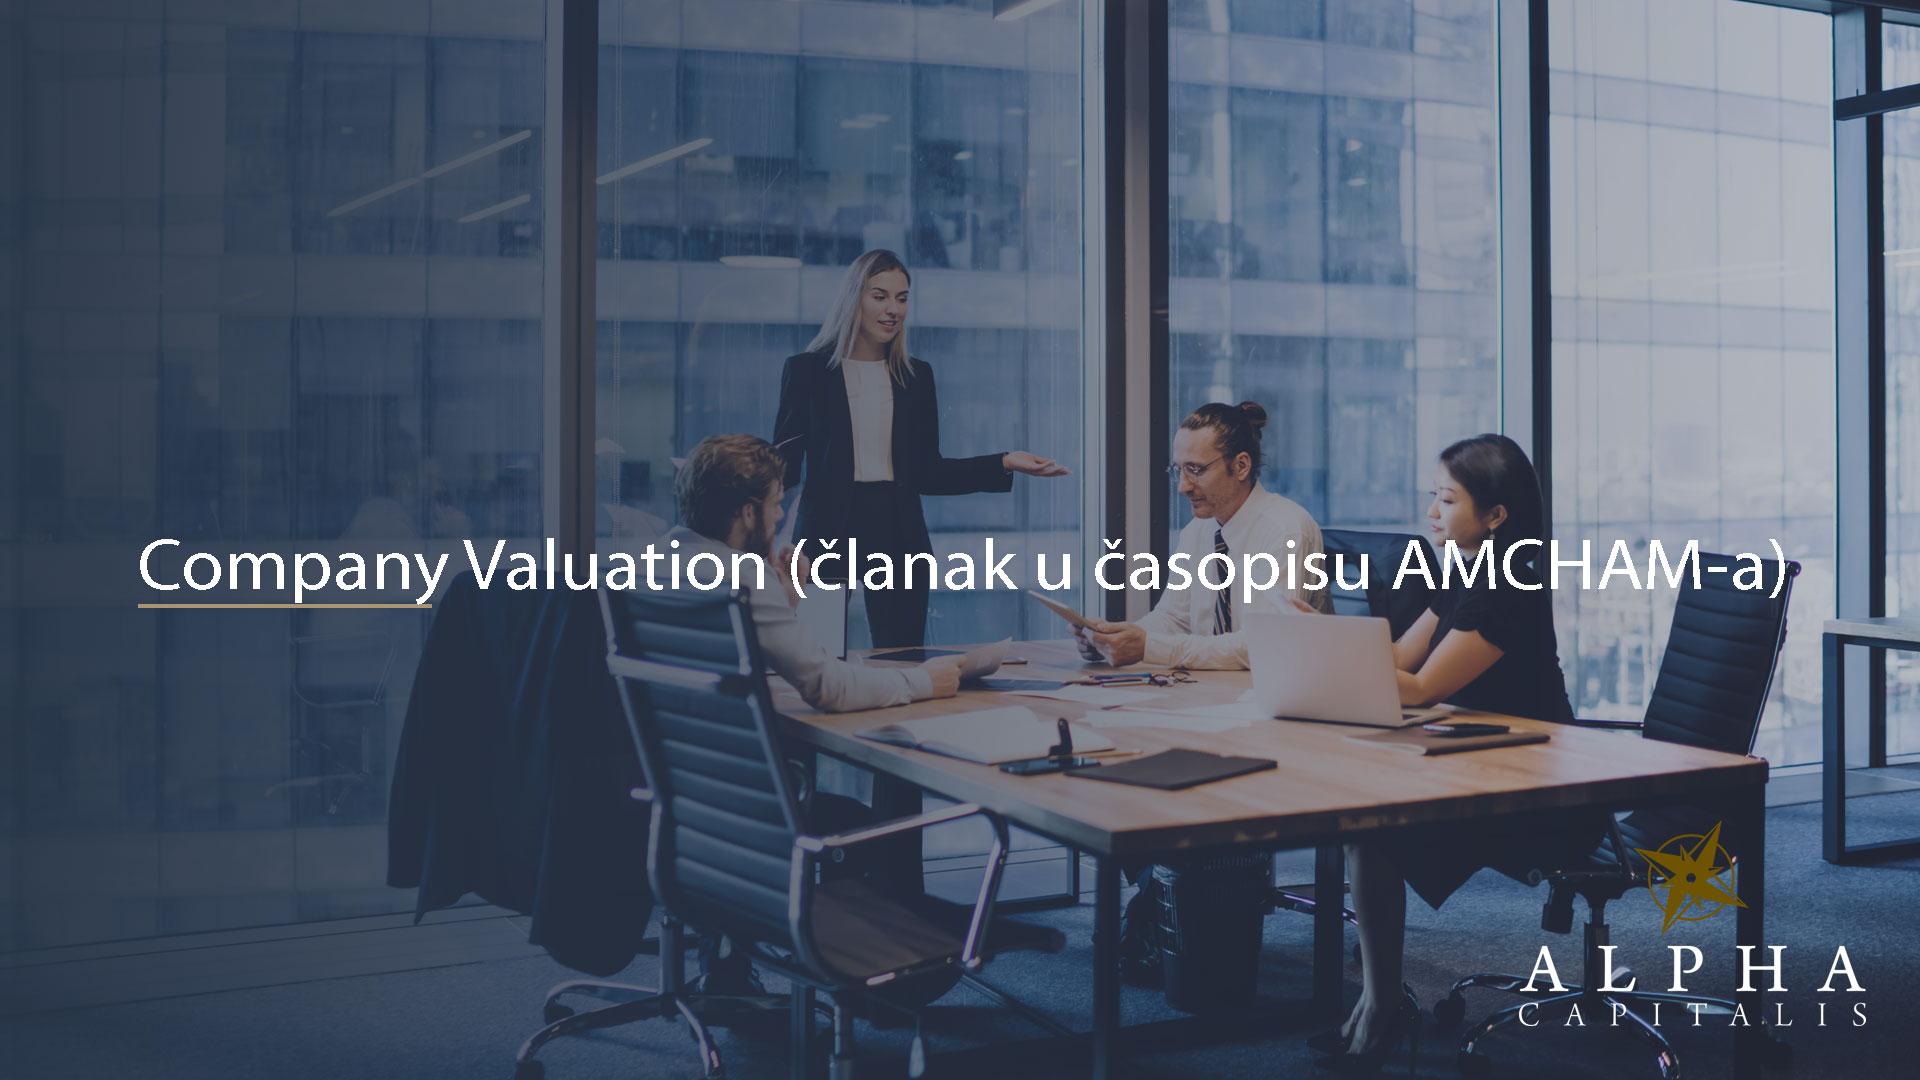 alpha-capitalis-am-cham-company-valuation